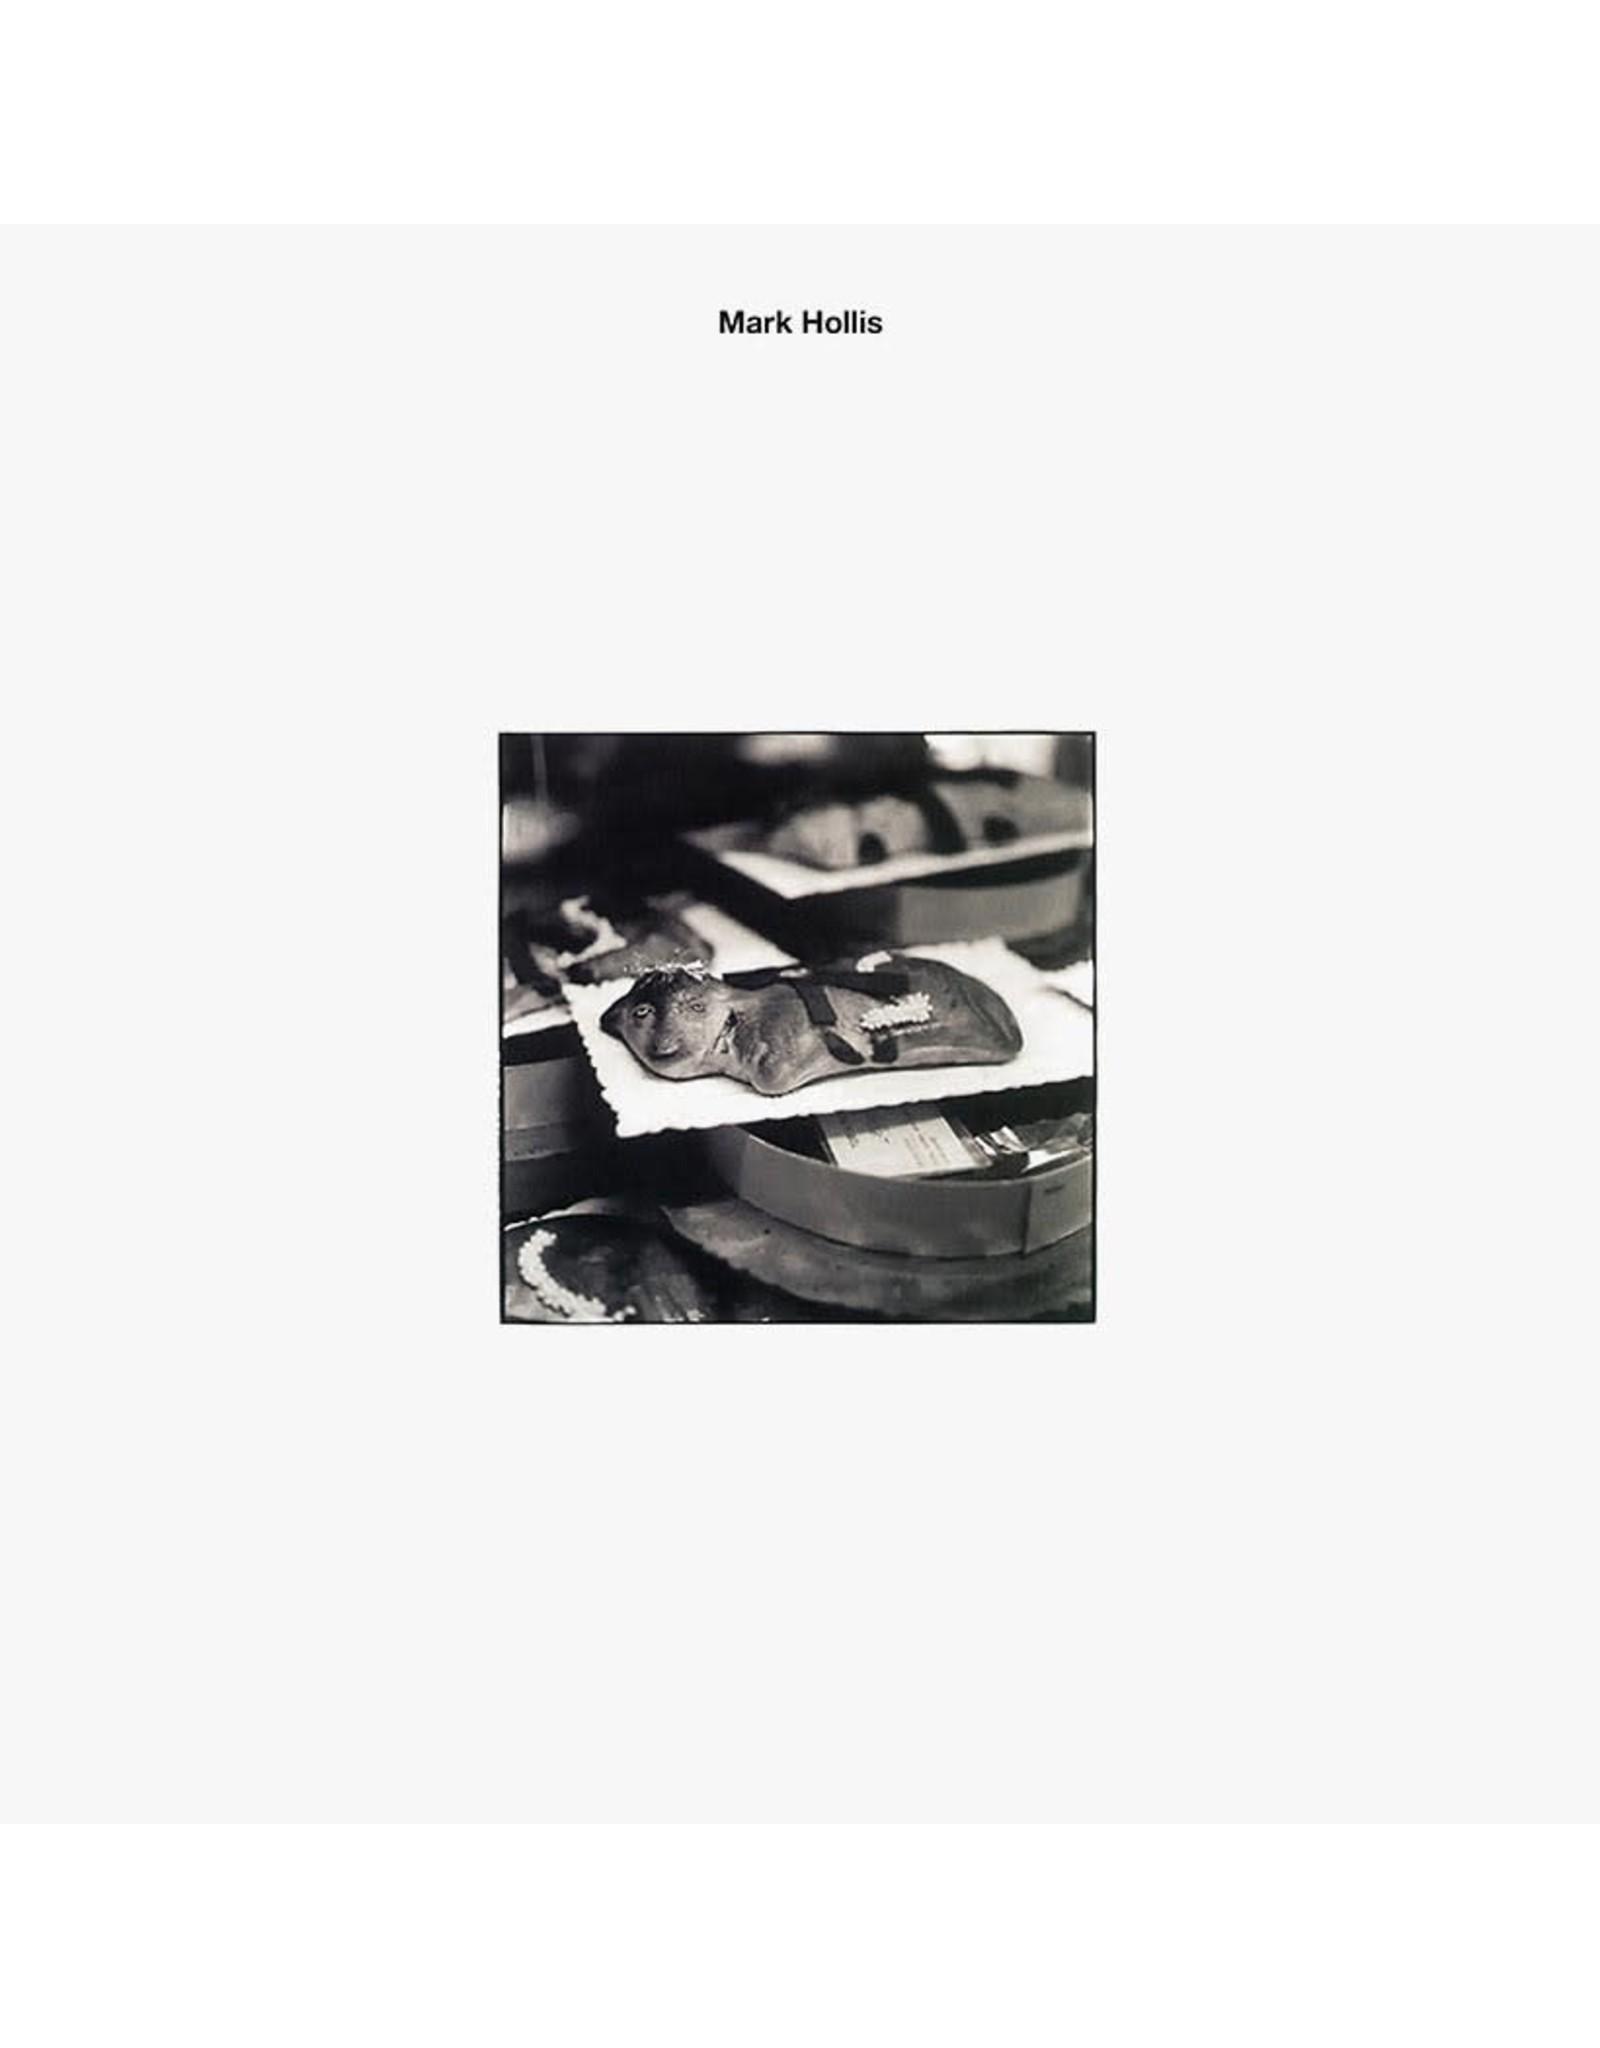 Universal Hollis, Mark: Mark Hollis LP